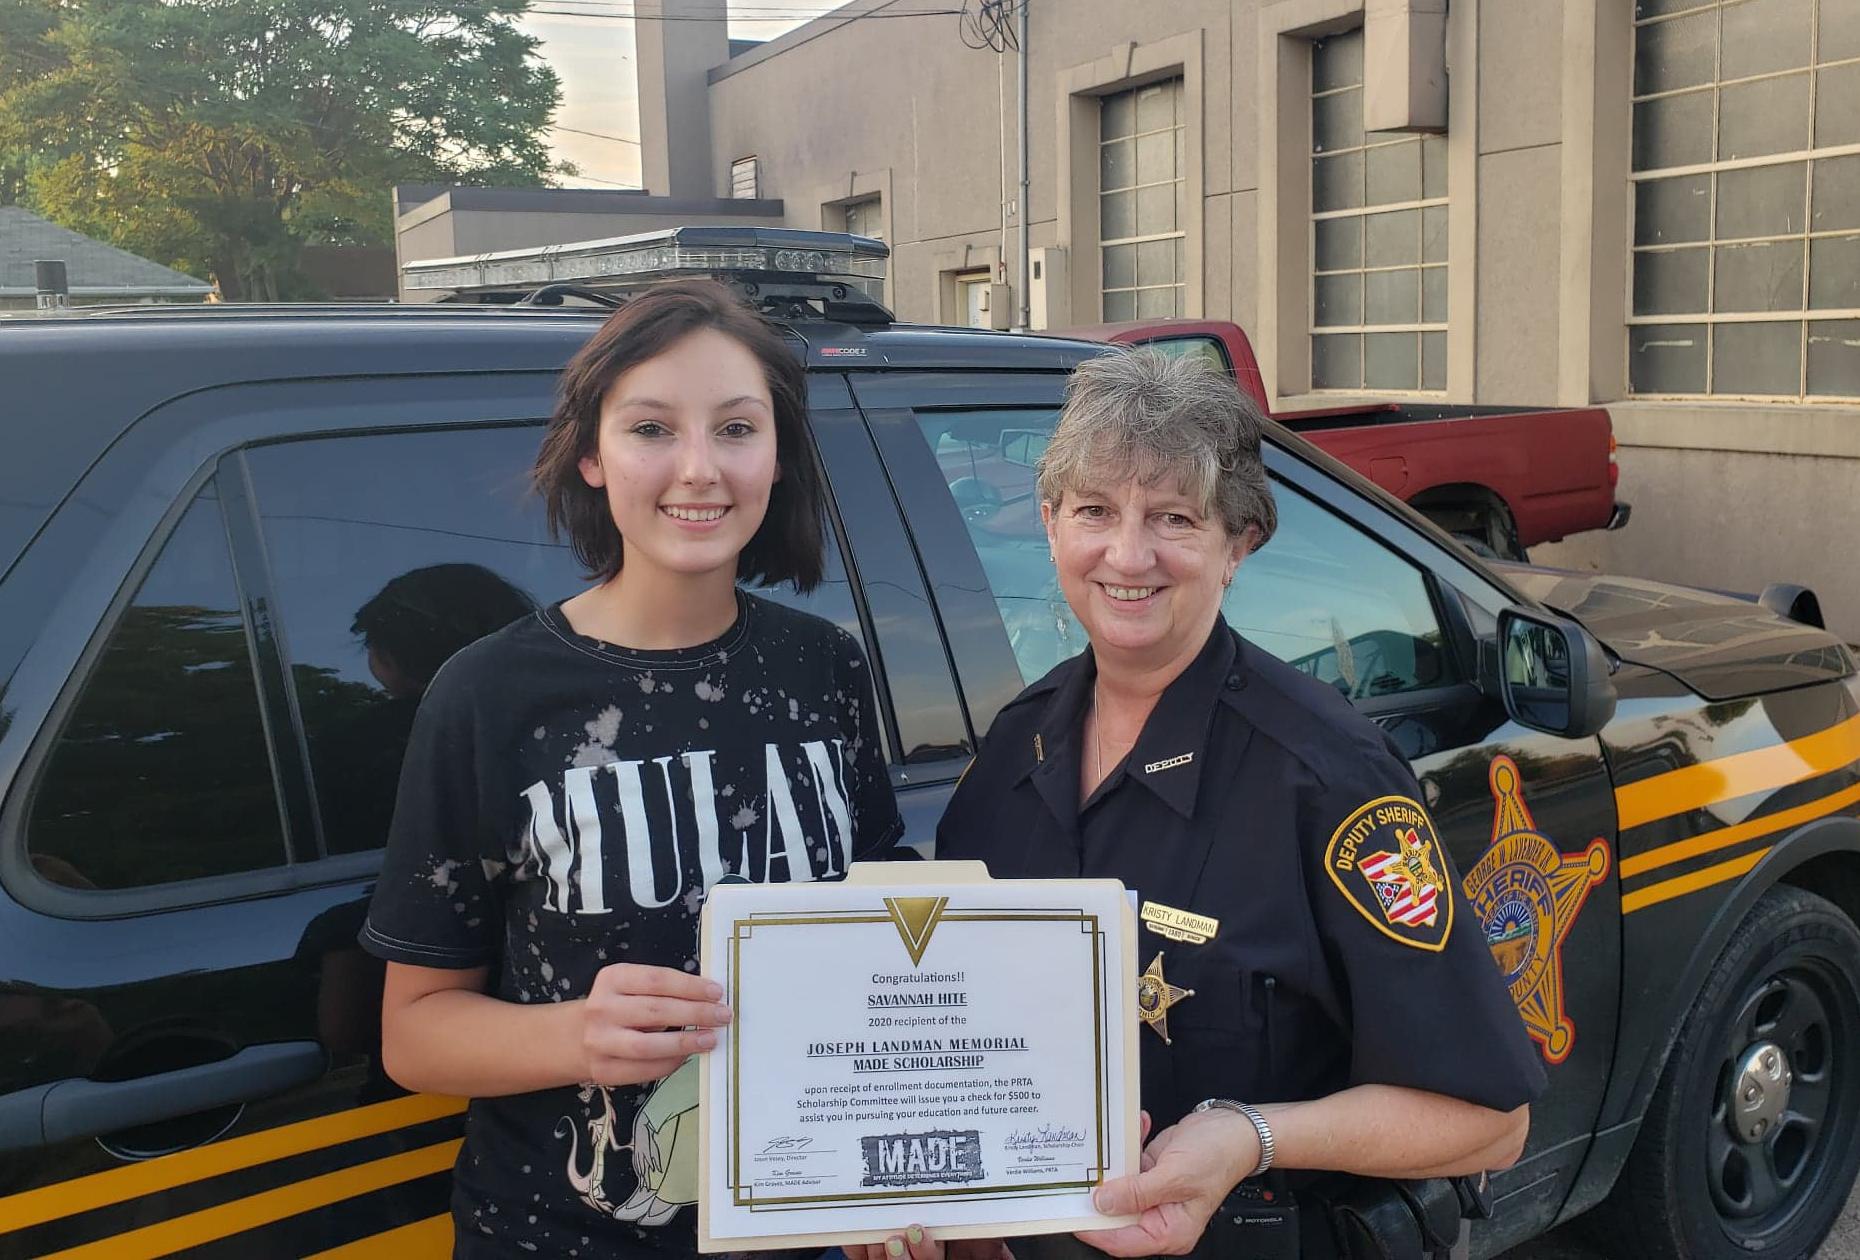 Savannah Hite, left, receives her scholarship certificate from Kristy Landman.